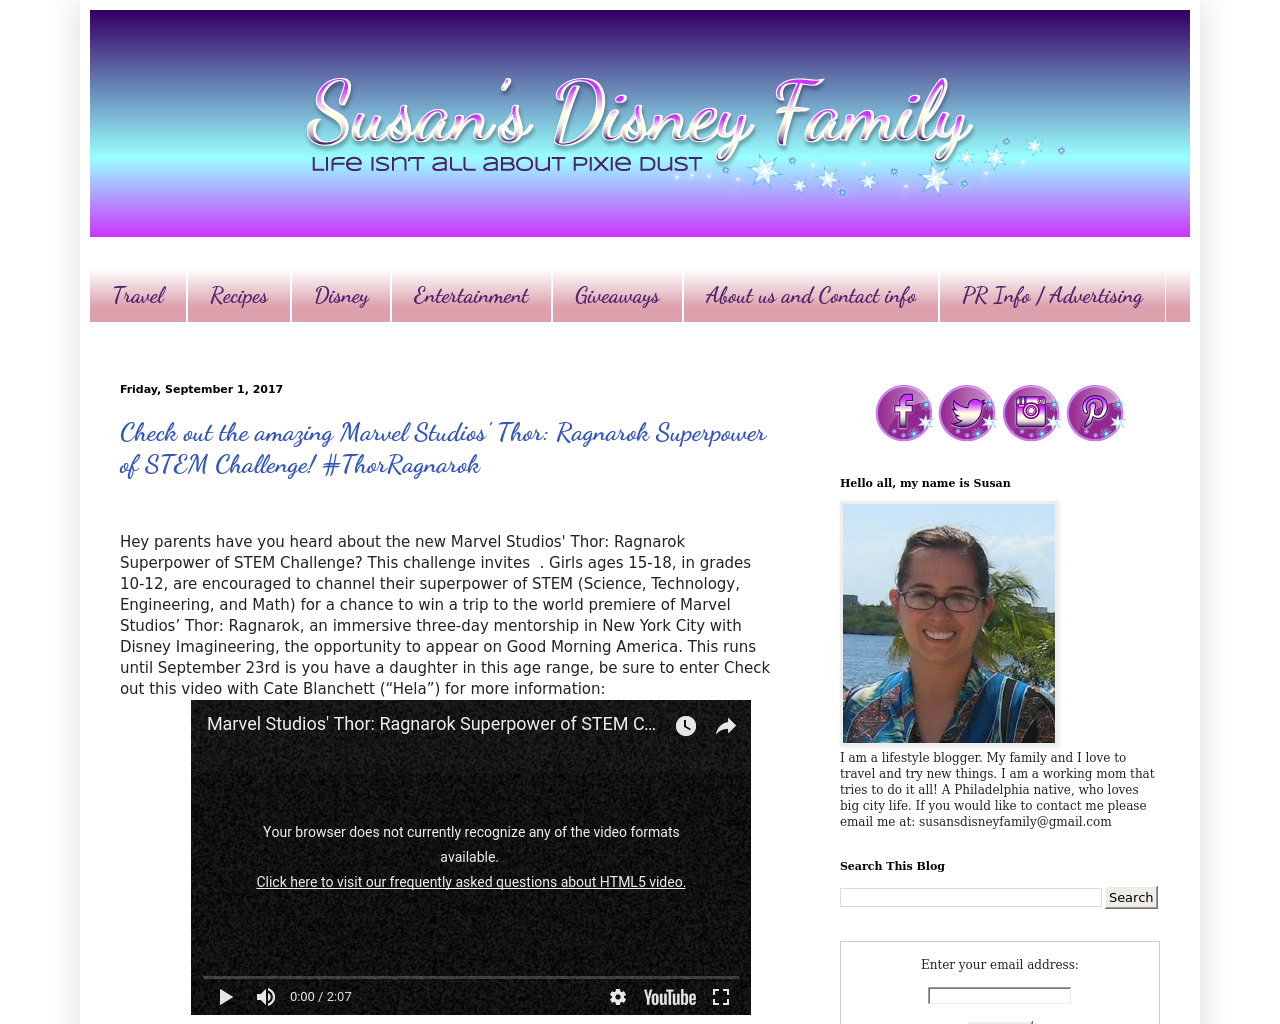 Susan's-Disney-Family-Advertising-Reviews-Pricing